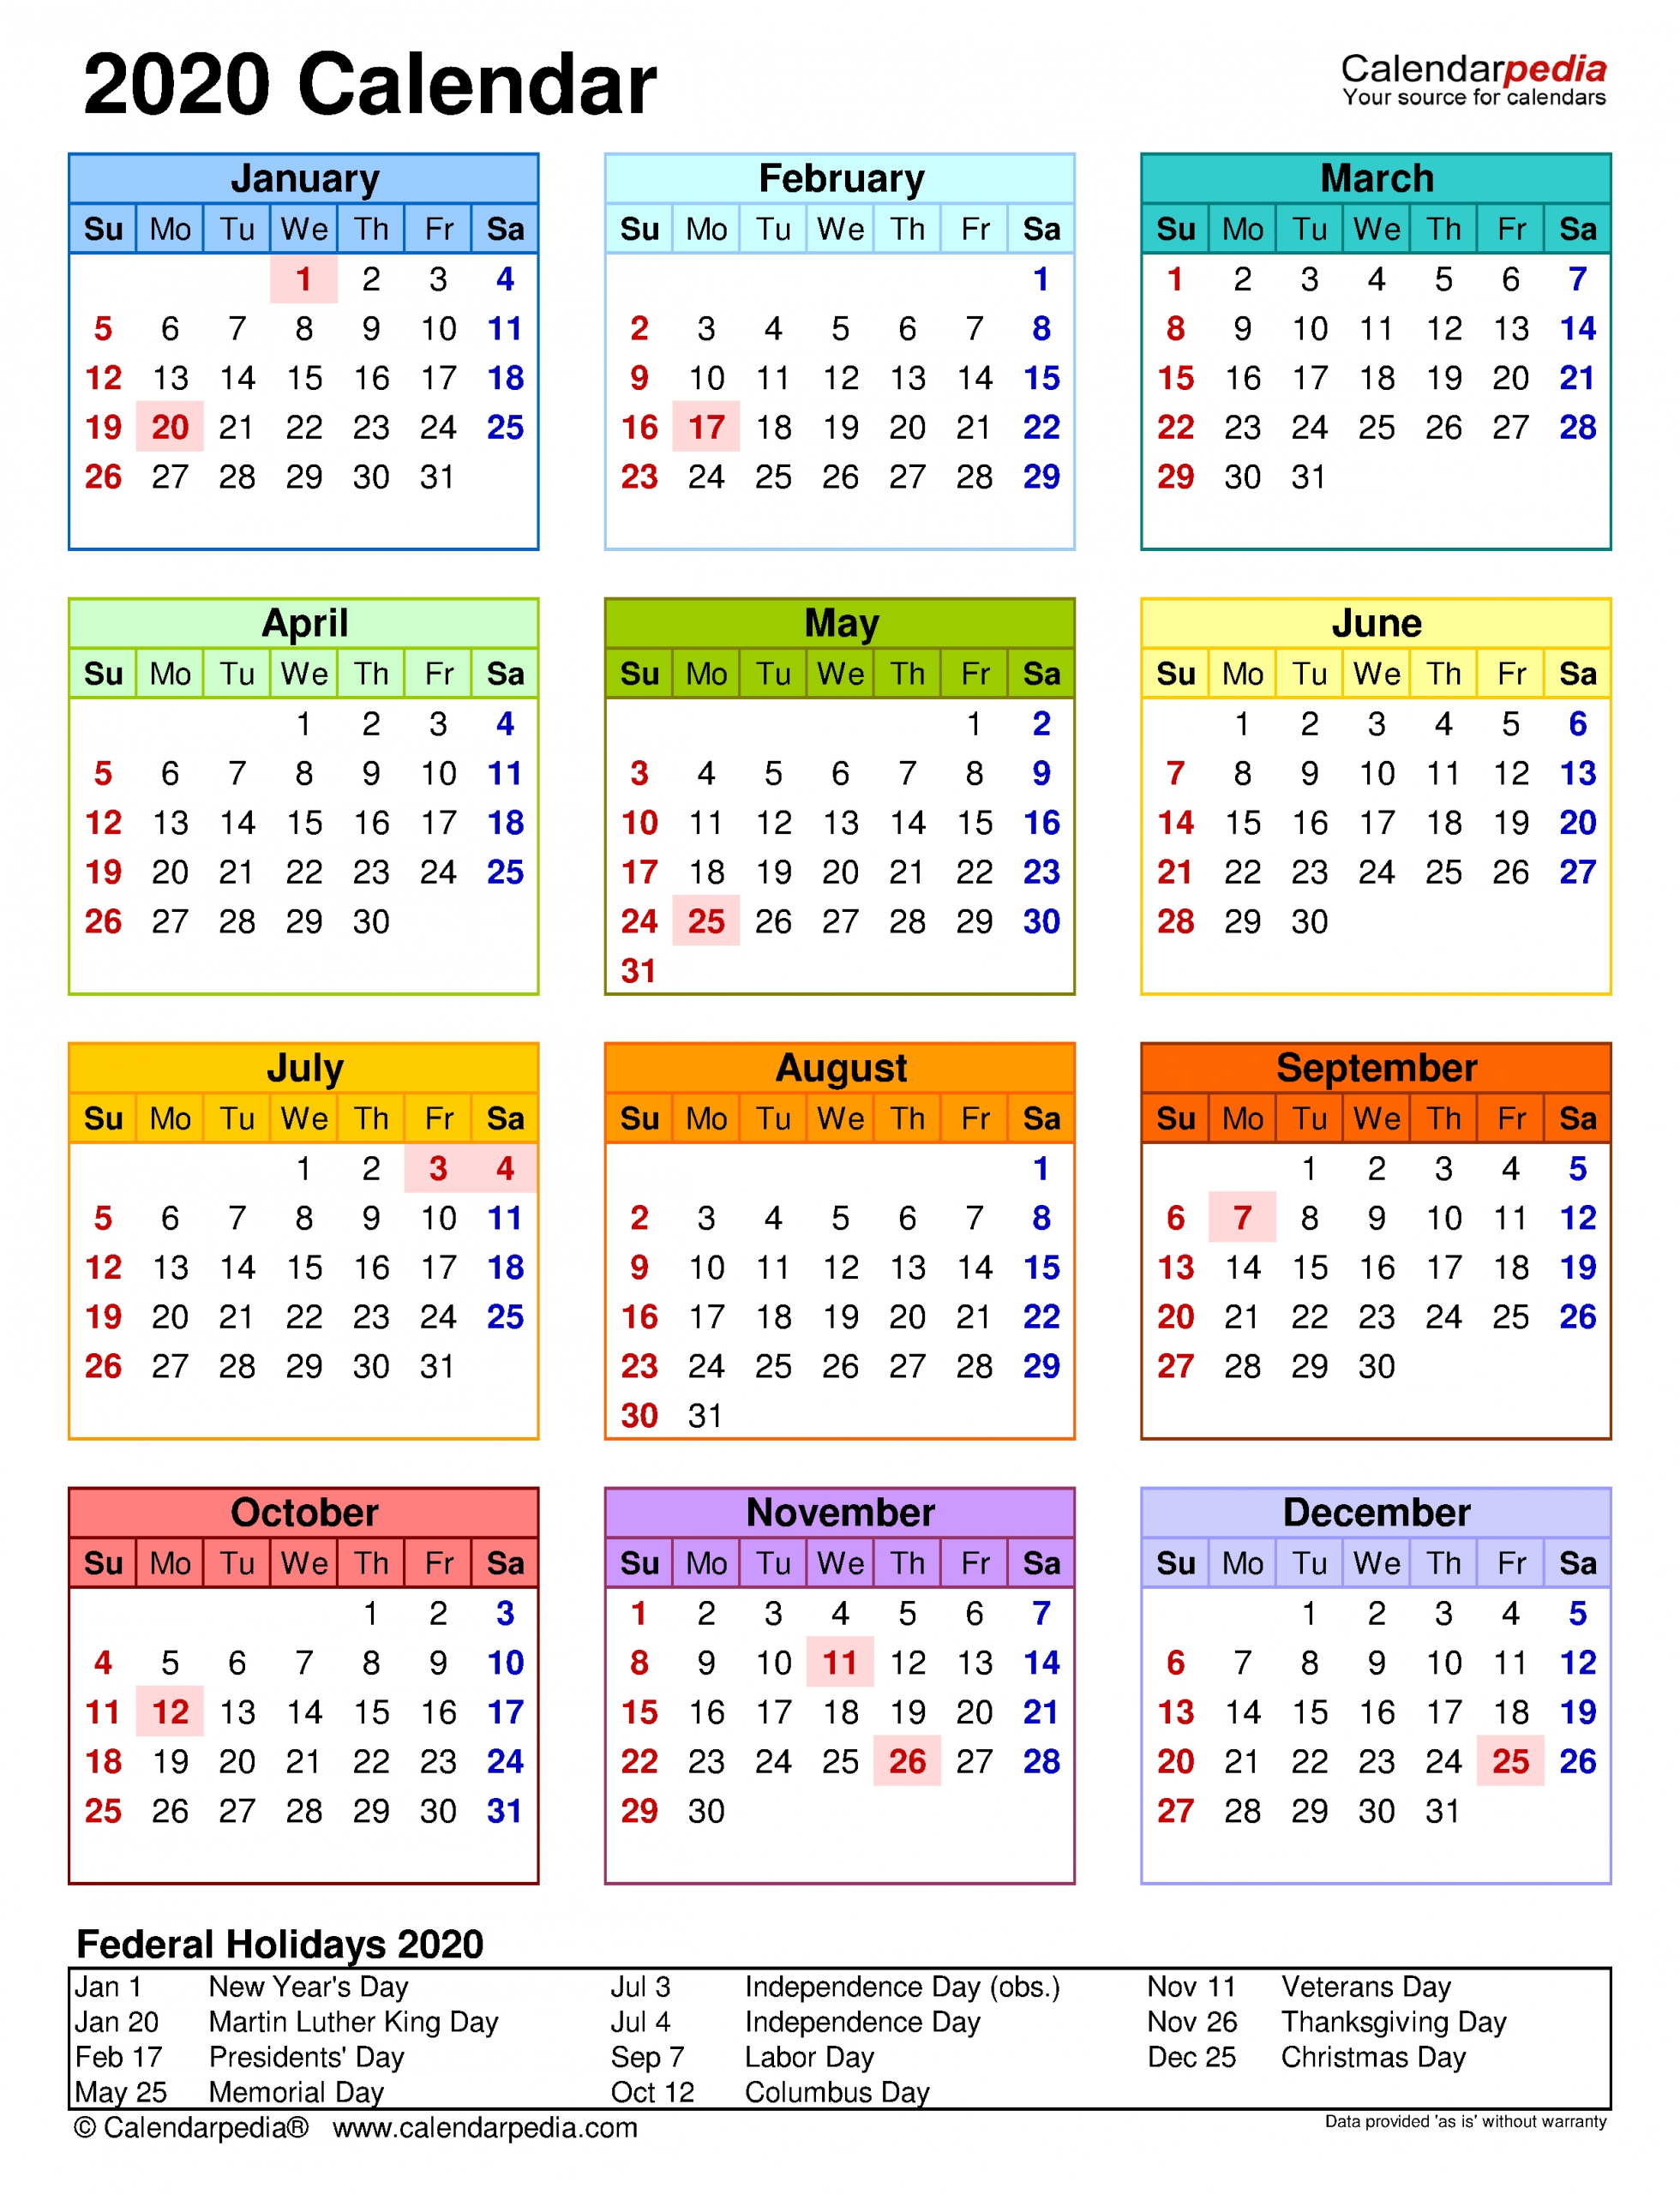 Free Printable Canadian Calendar 2021 5X7 | Printable Calendar 2021 throughout One Page2021 Calendar Printable Images